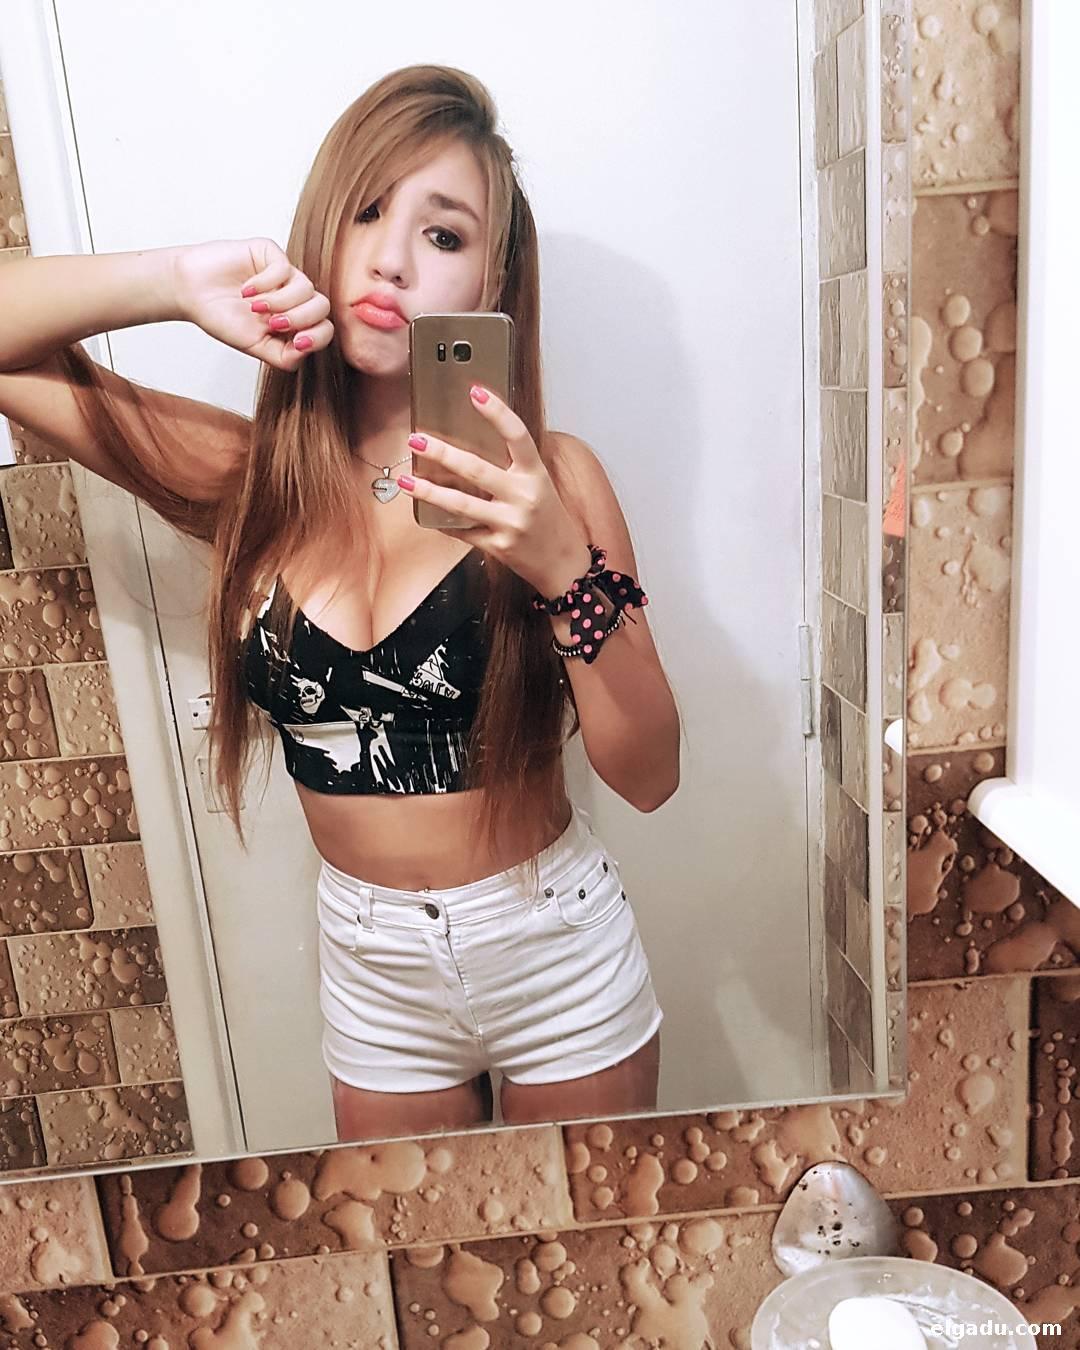 putas del instagram semen